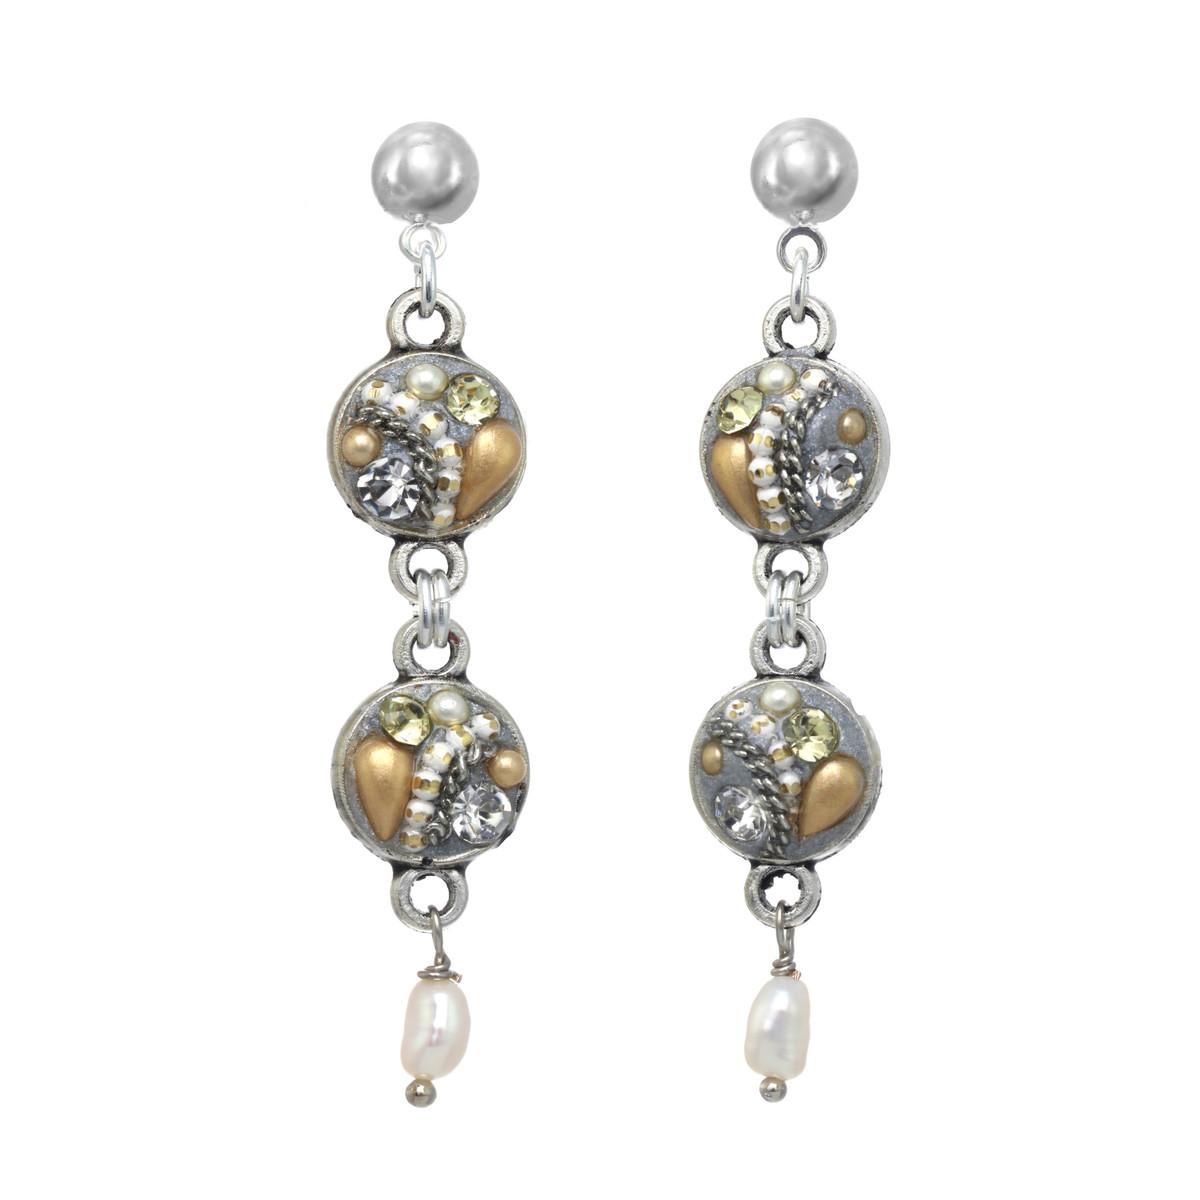 Michal Golan Moonlight Dangling Earrings